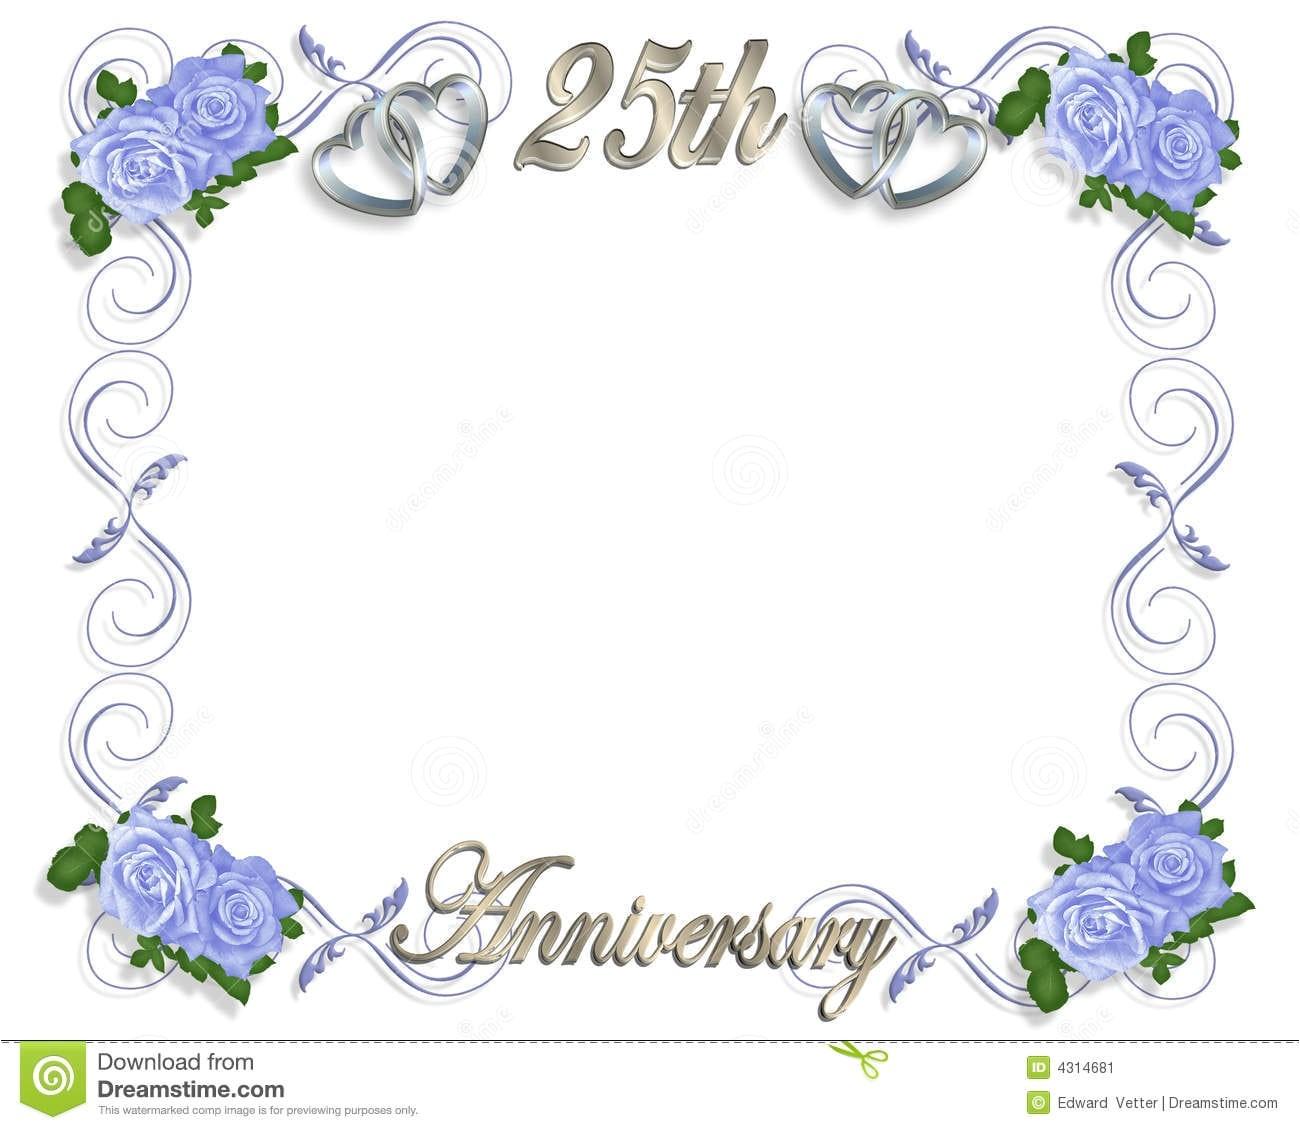 free wedding anniversary invitation template